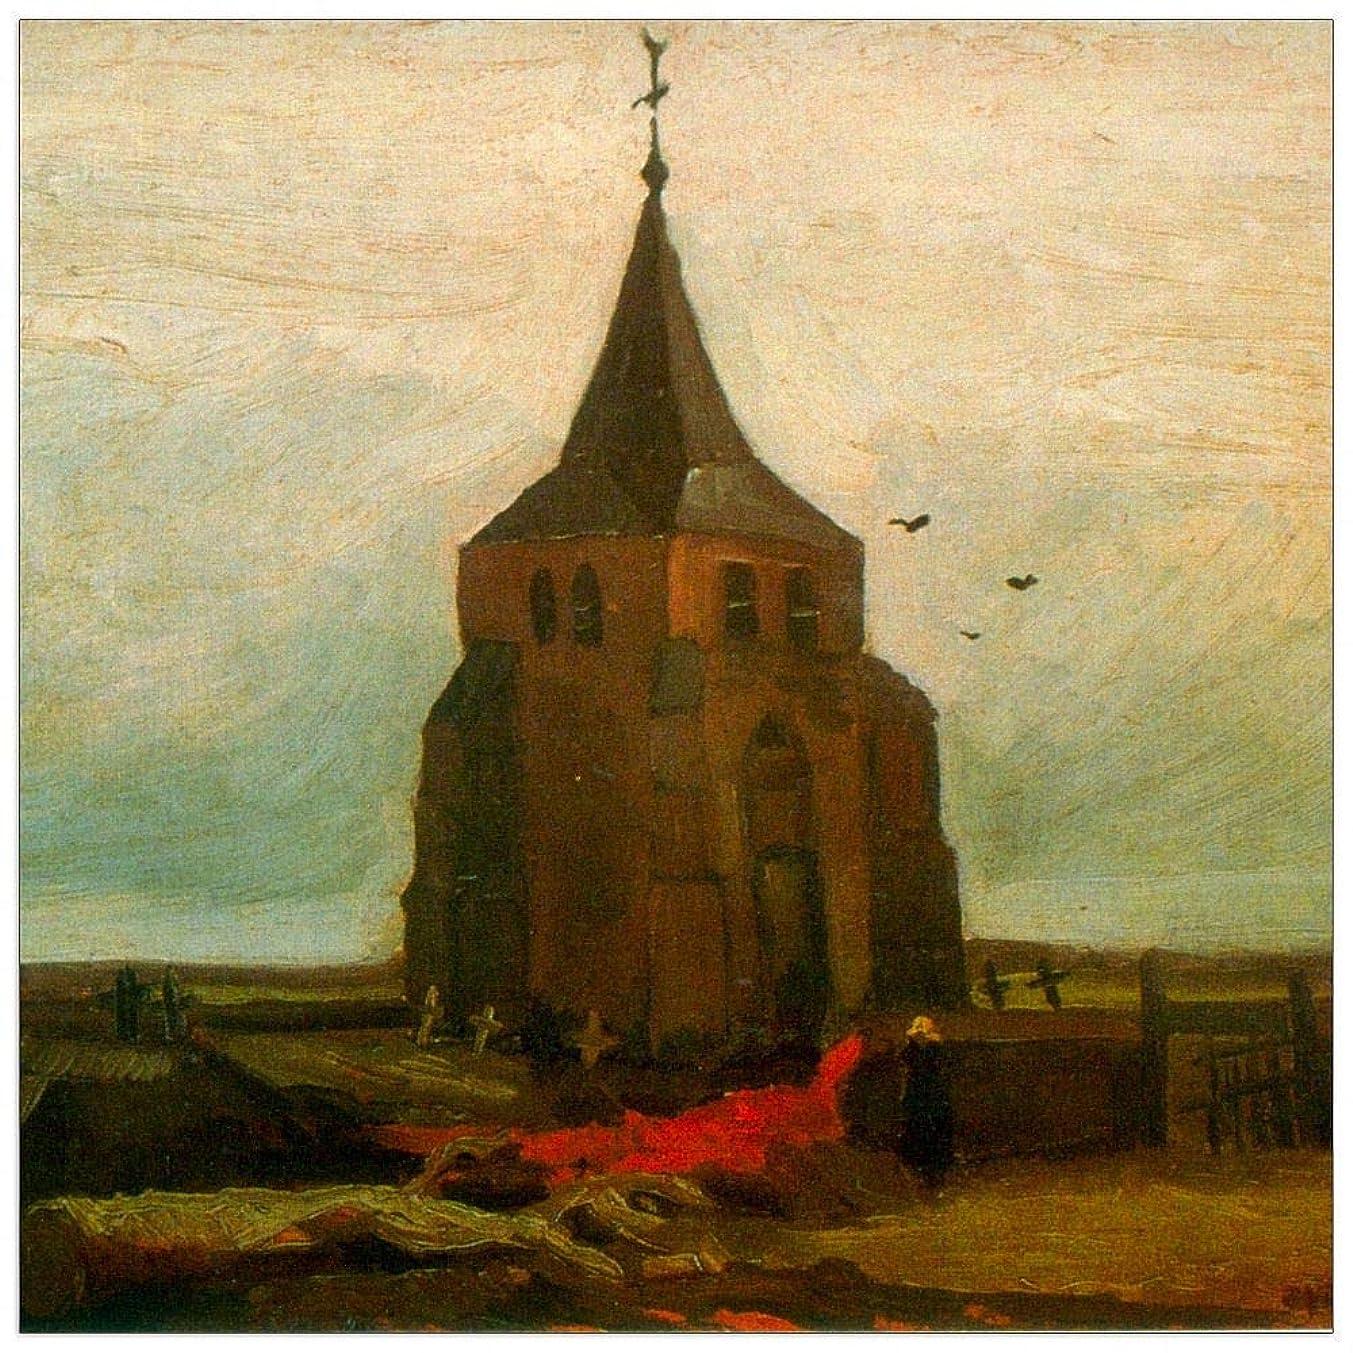 ArtPlaza TW90746 Van Gogh Vincent-Old Church Decorative Panel, 31.5x31.5 Inch, Multicolored